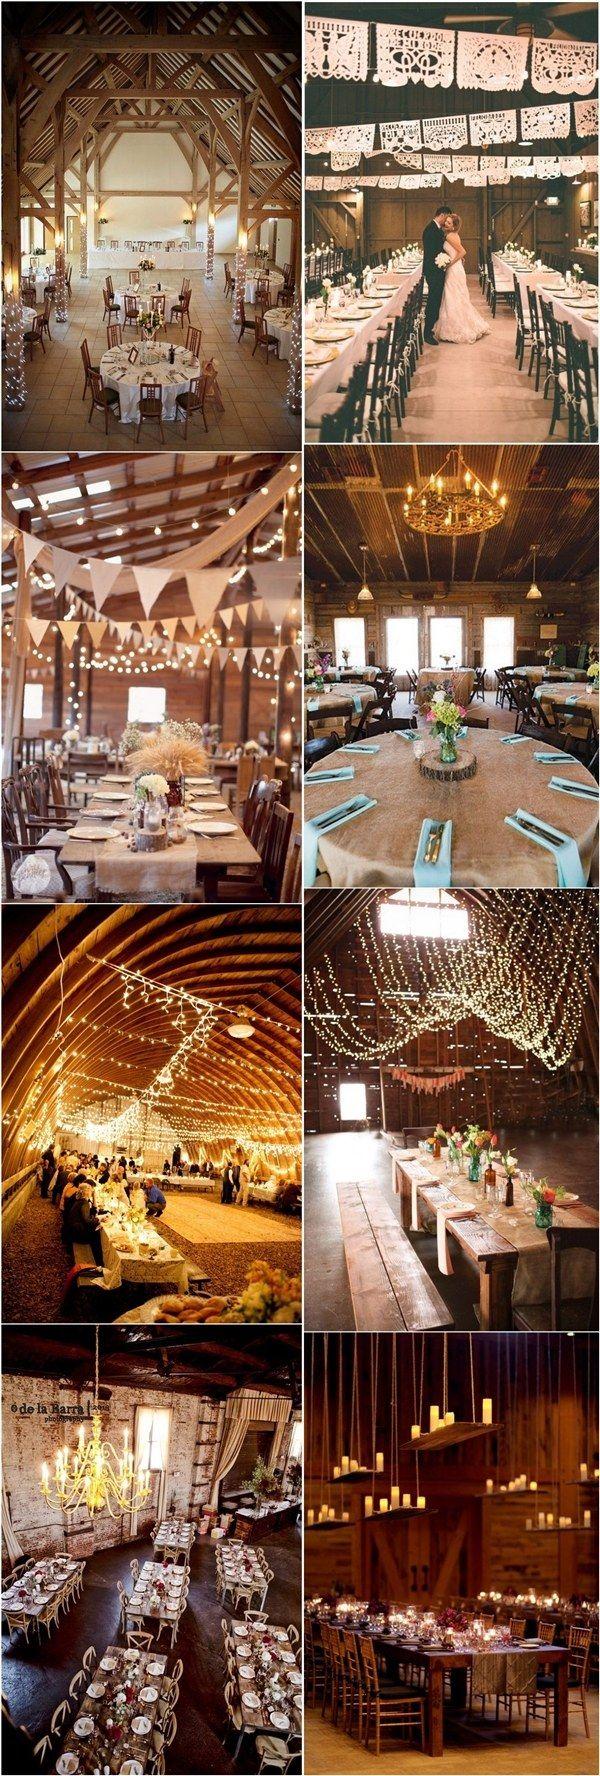 Barn wedding table settings   best Hannah rustic wedding images on Pinterest  Wedding ideas